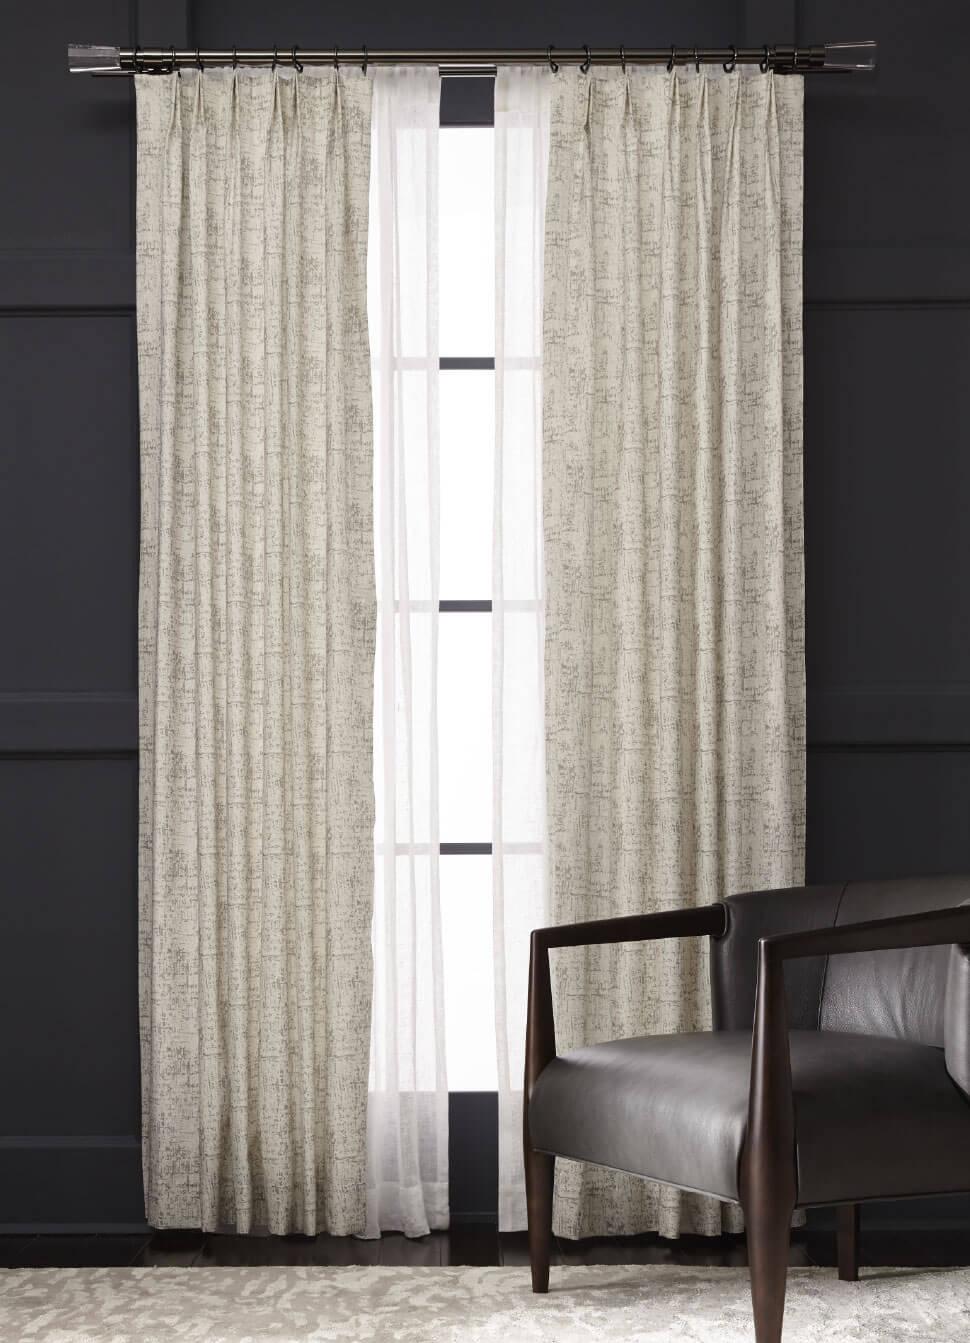 Birch drapery collection: Pattern